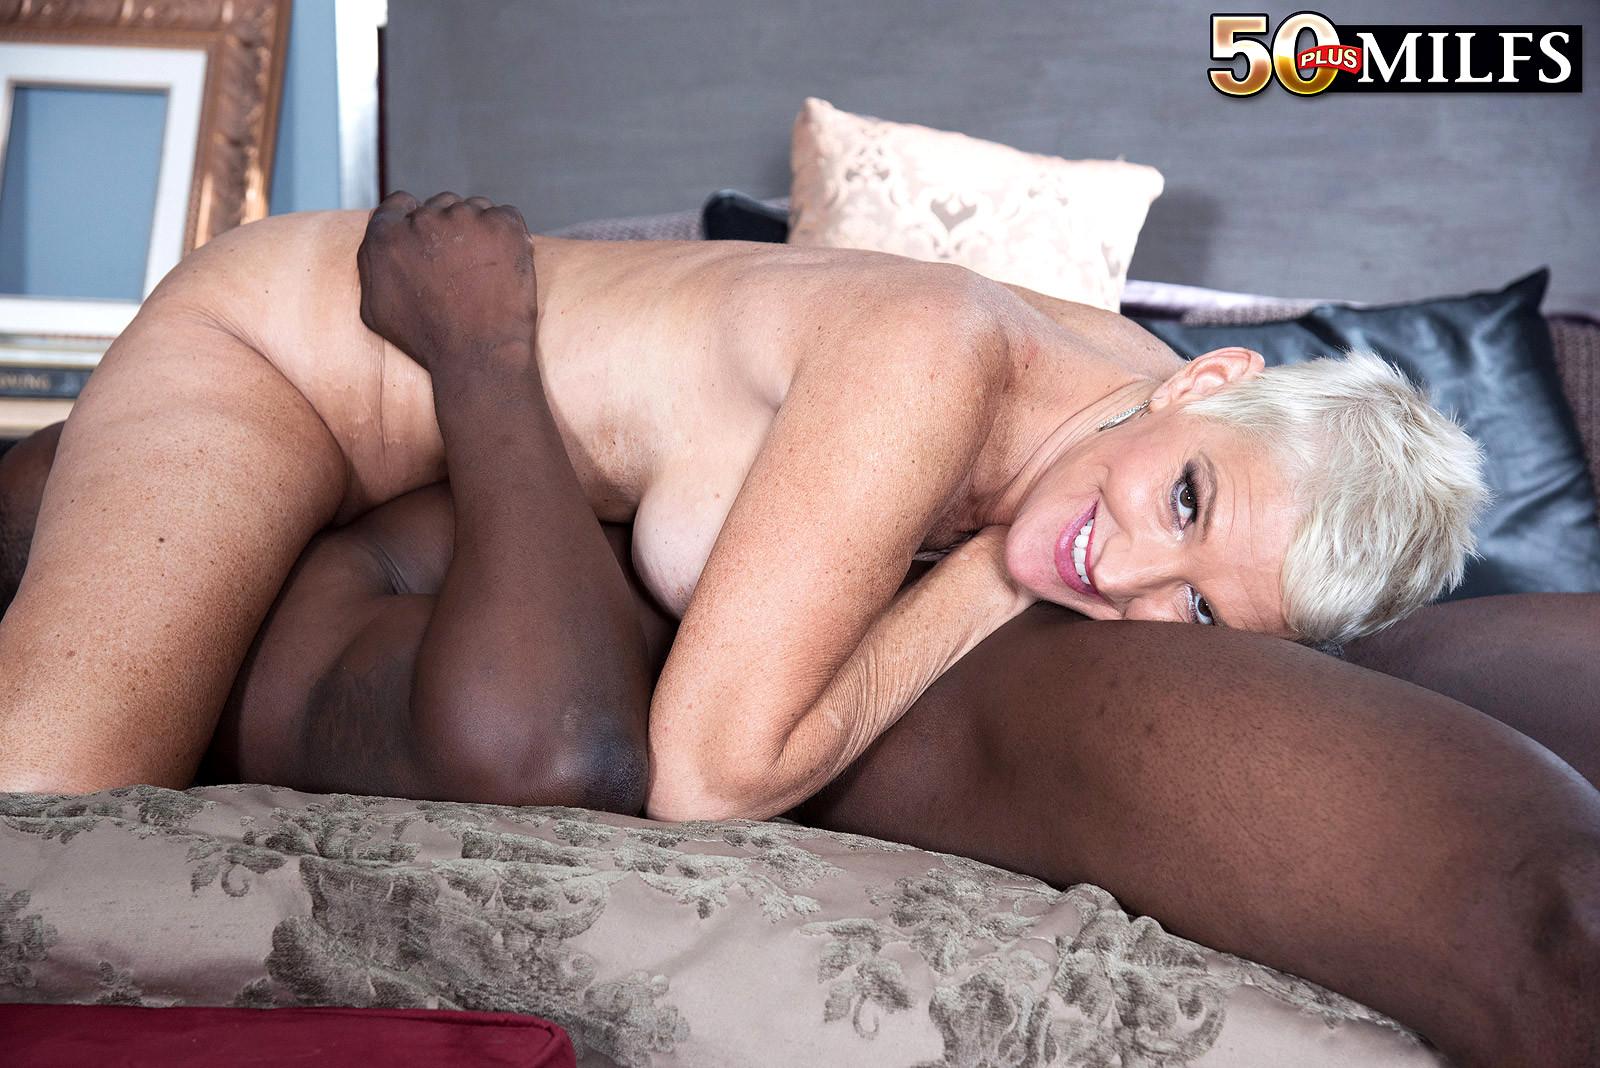 Babe Today 50 Plus Milfs Lexy Cougar Fullhd Pornstars -2987